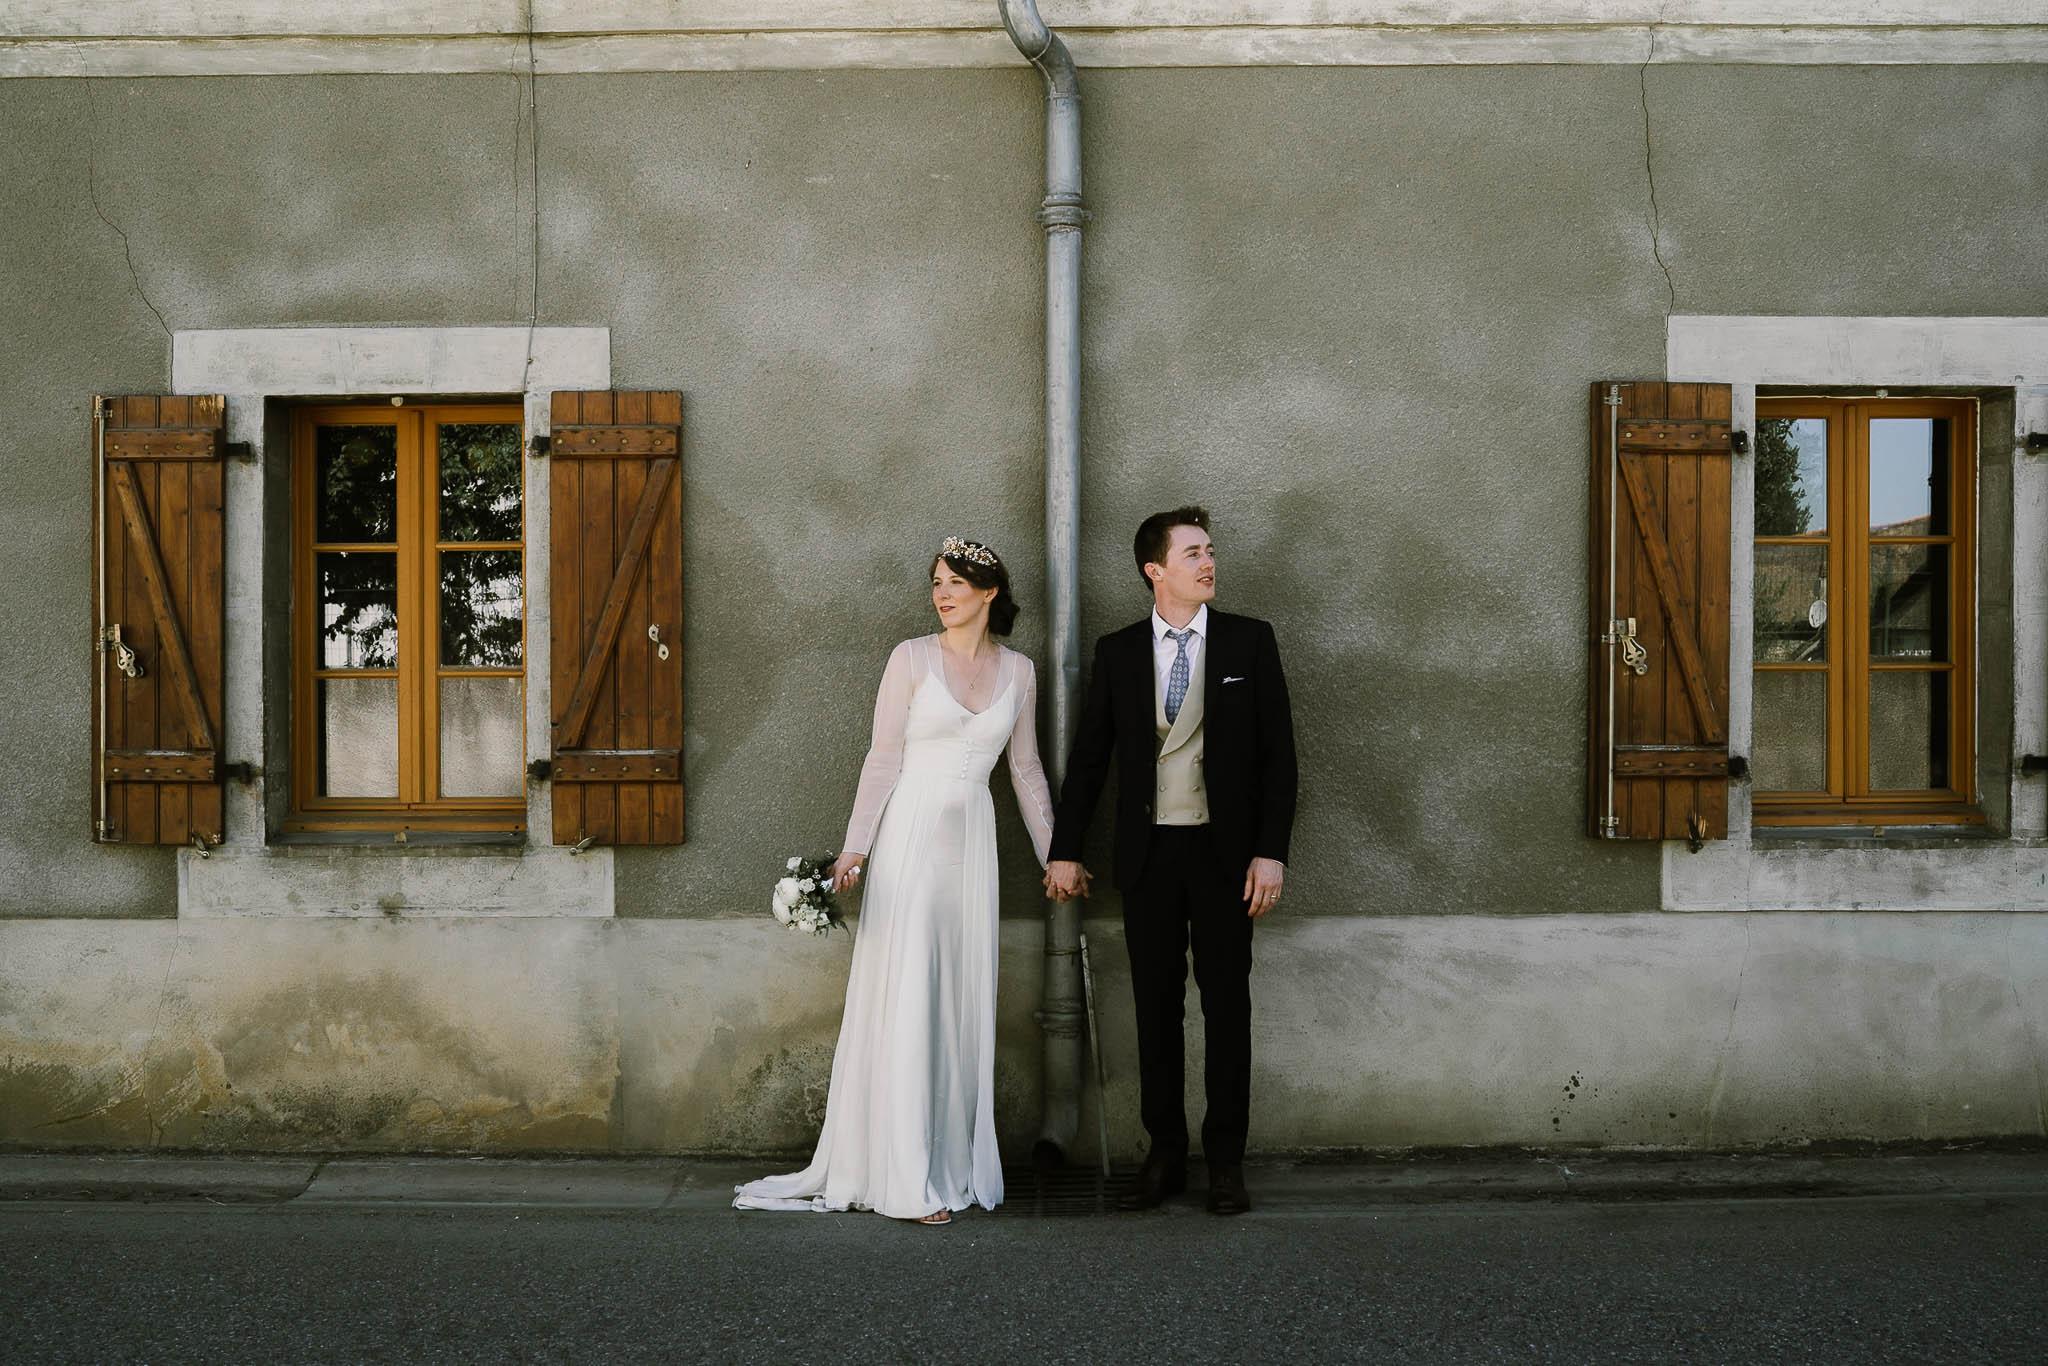 Wedding-Photography-East-Sussex-28.jpg